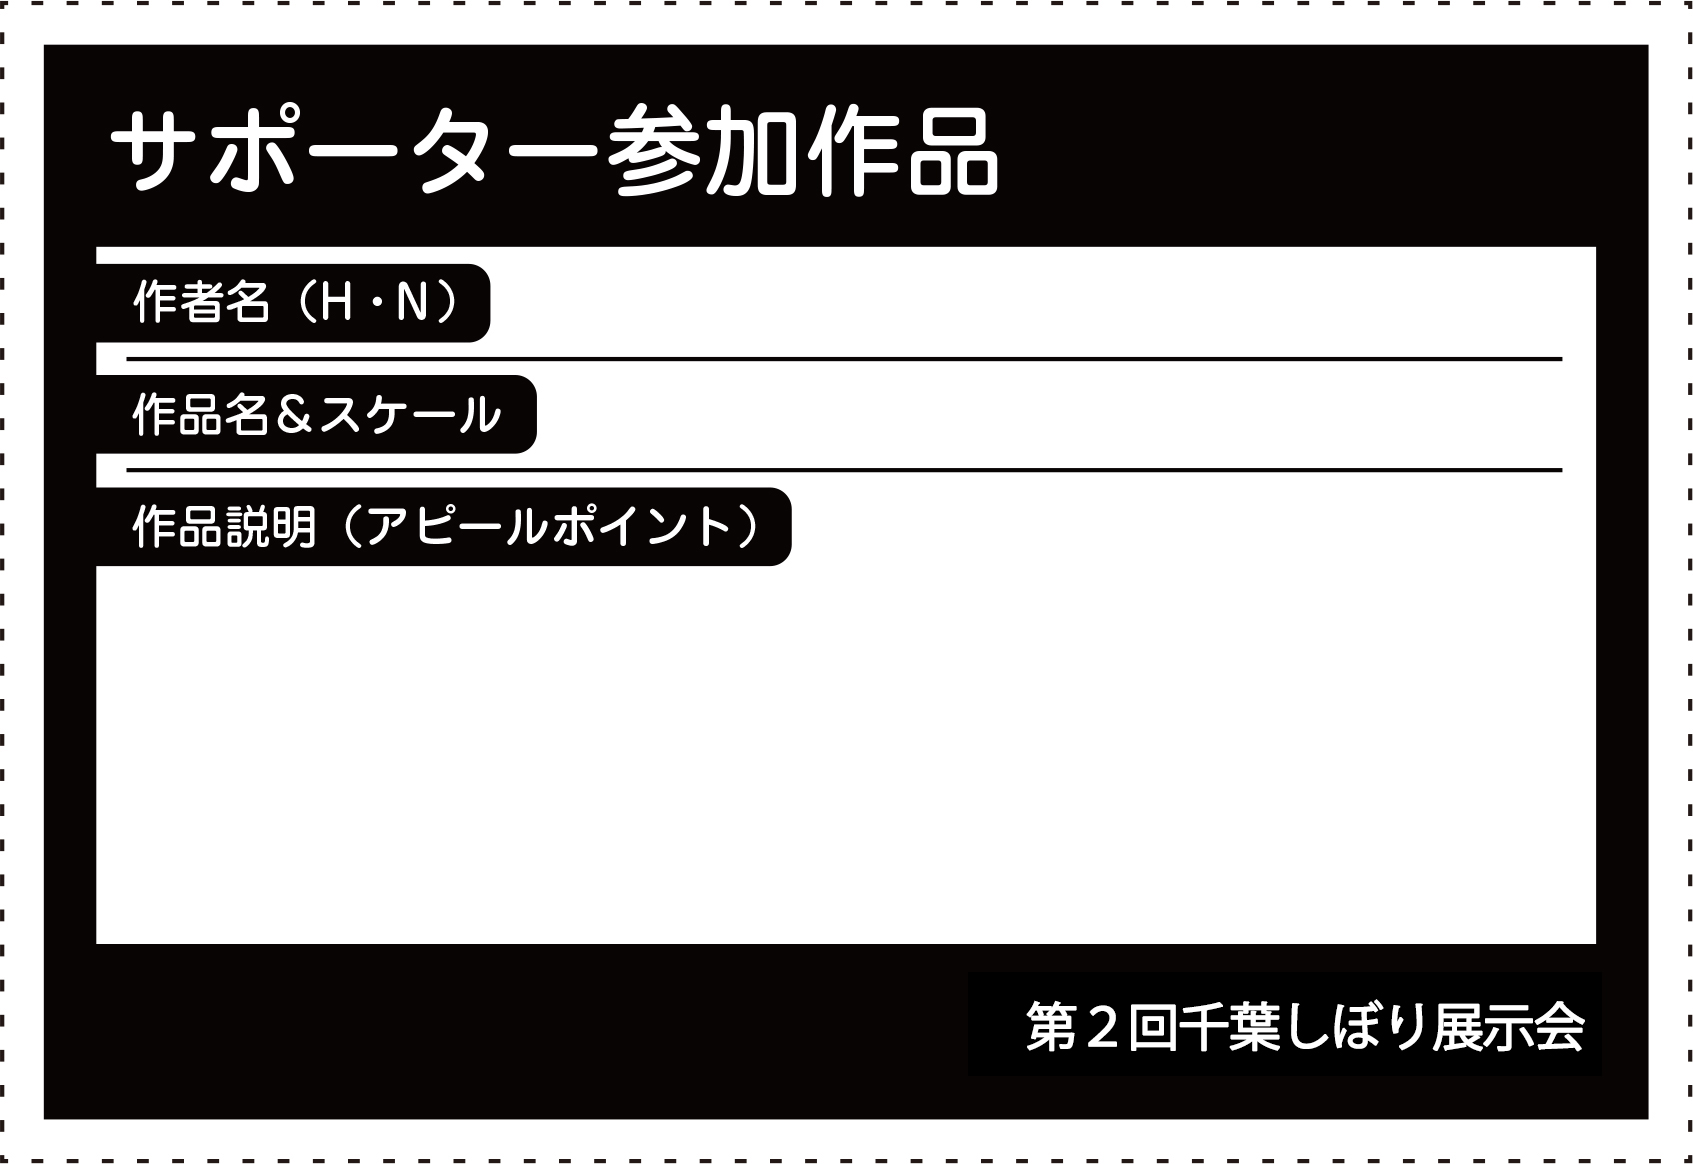 supporter_card2.jpg